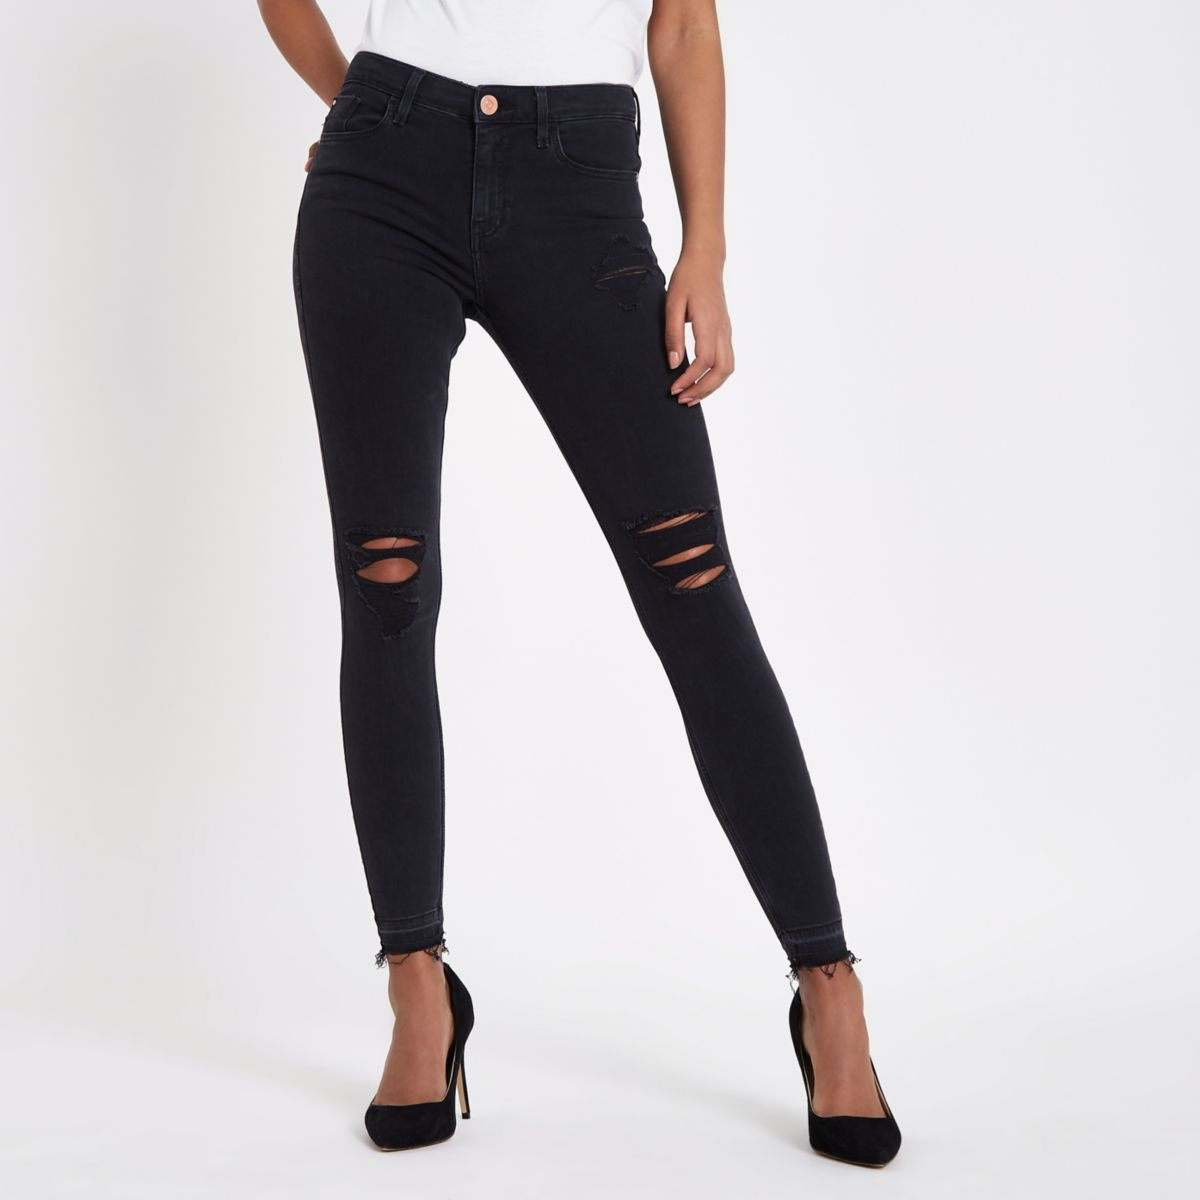 Amelie - Zwarte ripped superskinny jeans